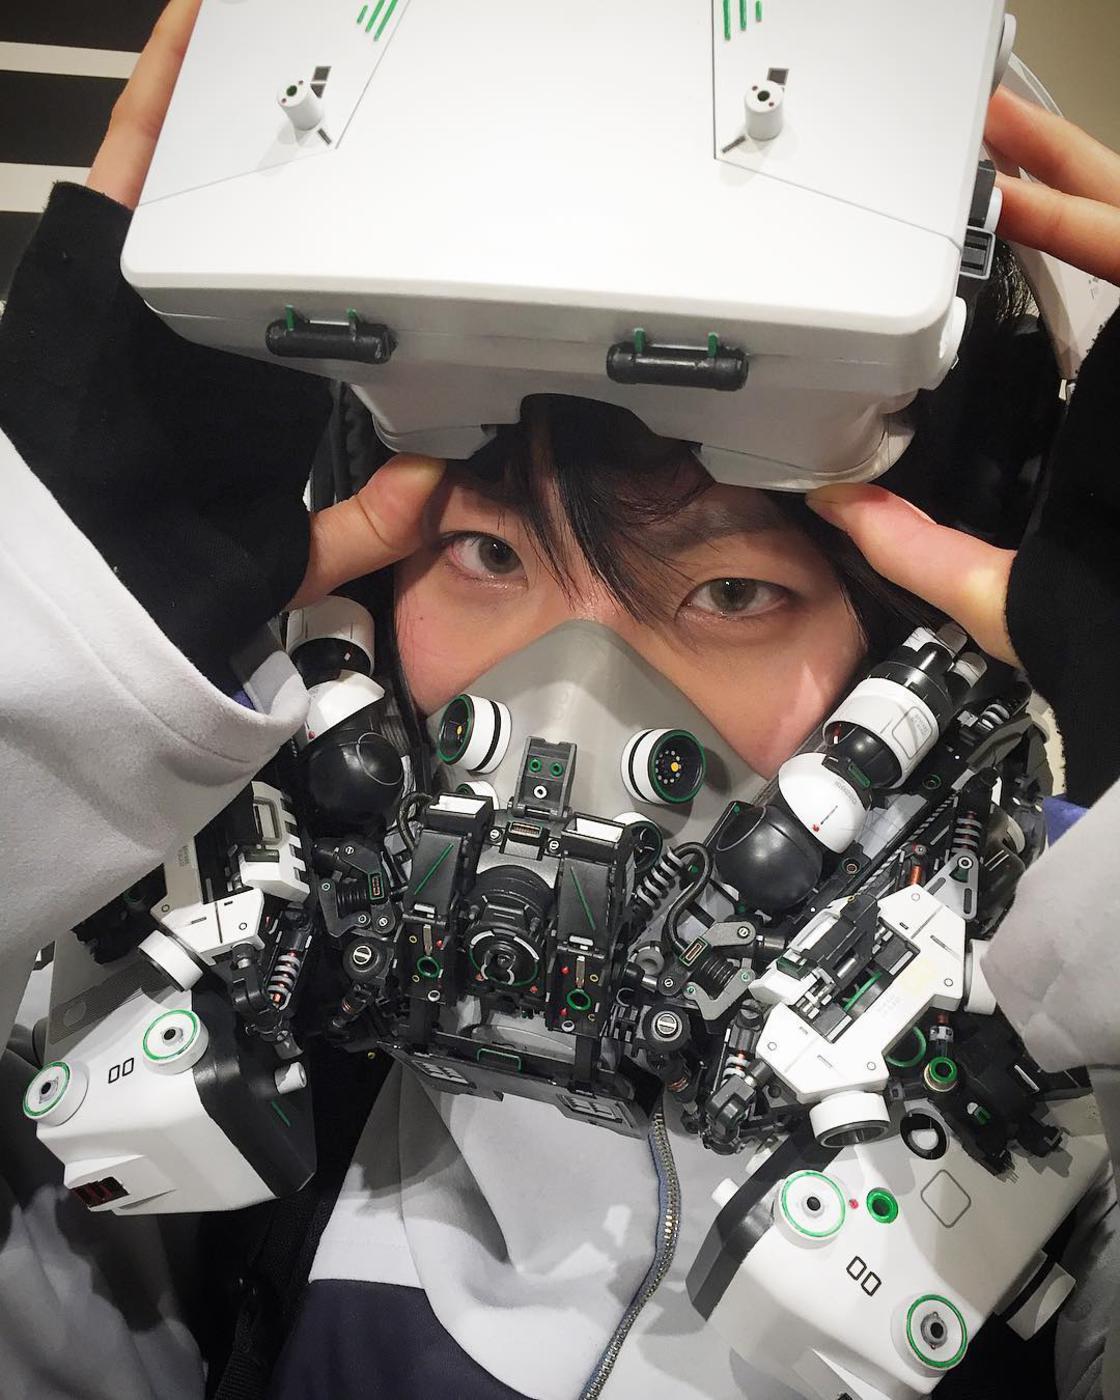 Cyberpunk – The impressive creations of Hiroto Ikeuchi